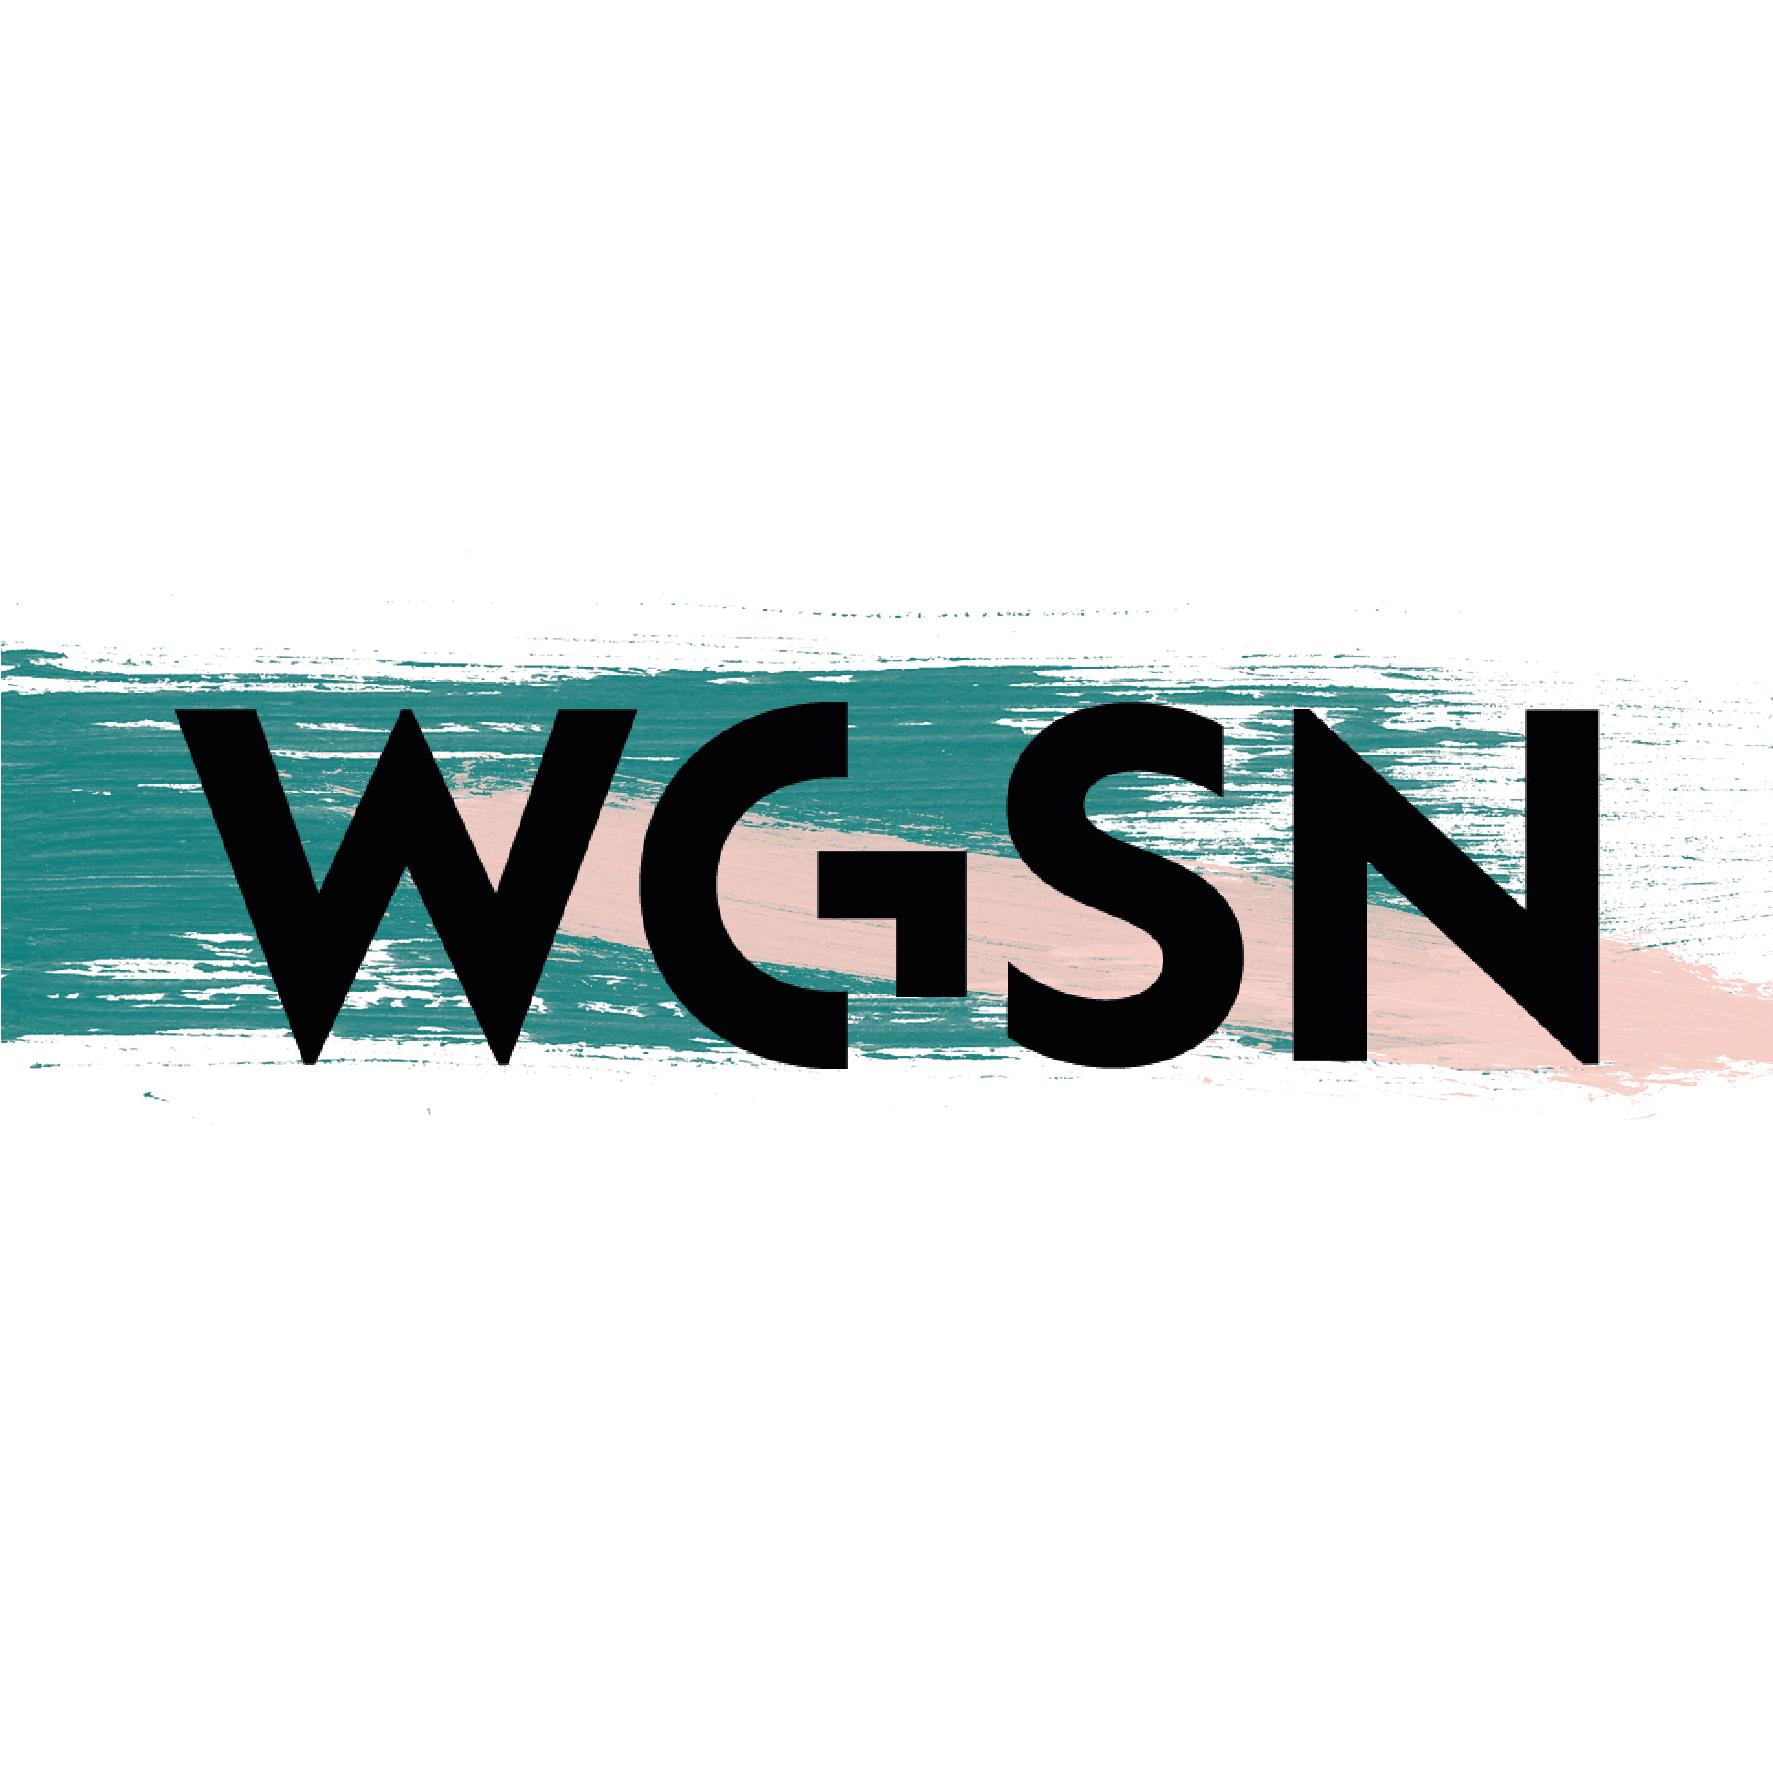 """WGSN Beauty: The multibillion-dollar beauty market still up for grabs""   18 April 2019"